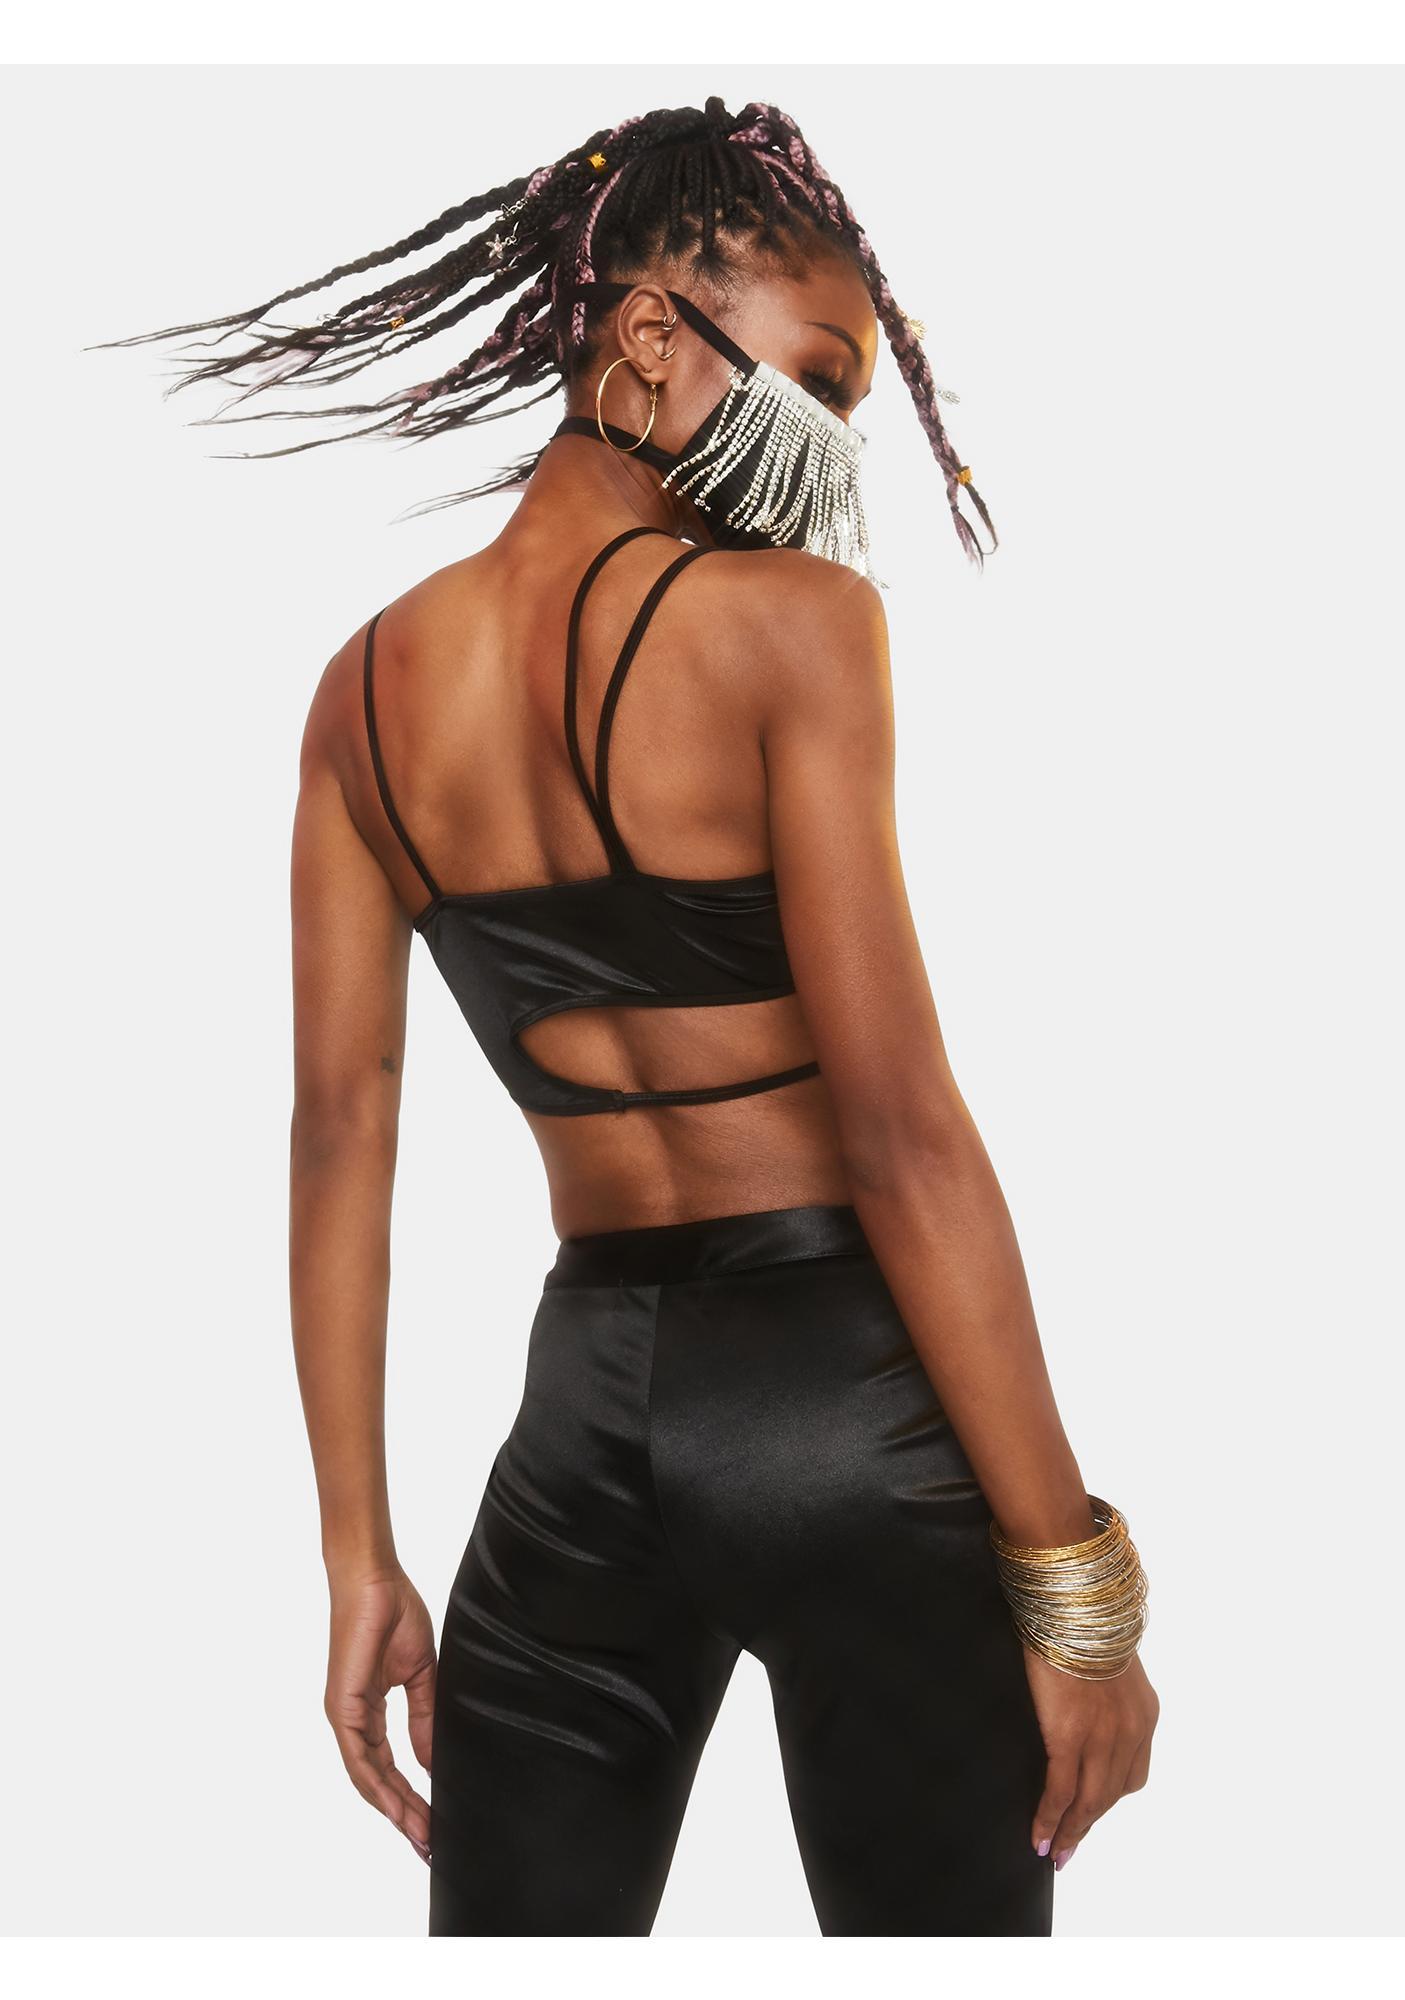 Club Exx Supernova Girl Asymmetrical Bra Top